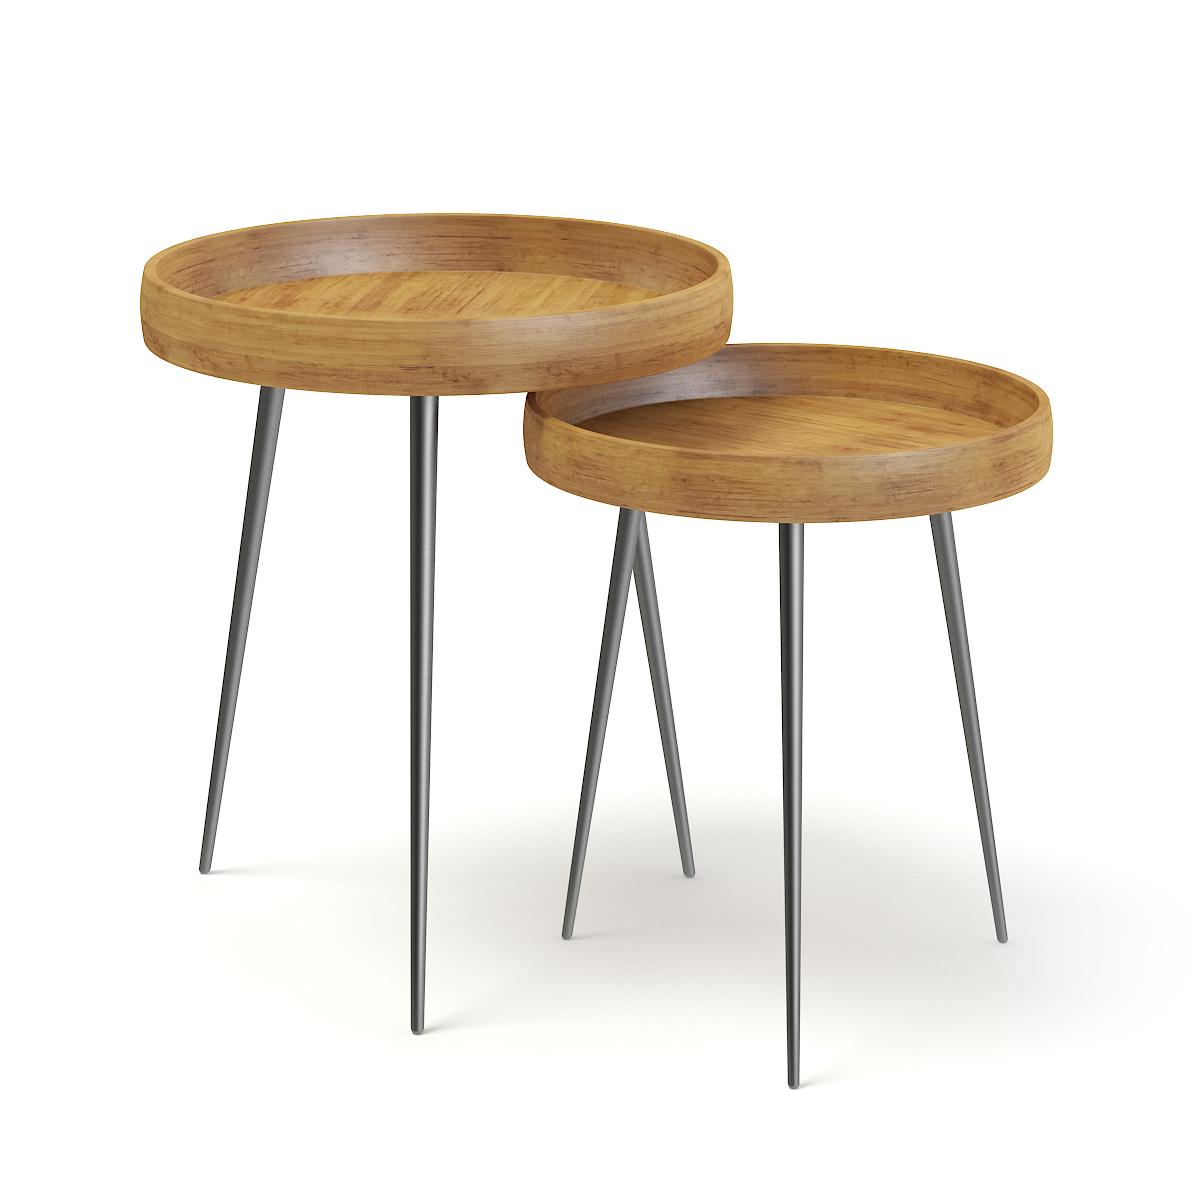 Small Tables Model Turbosquid 1269501